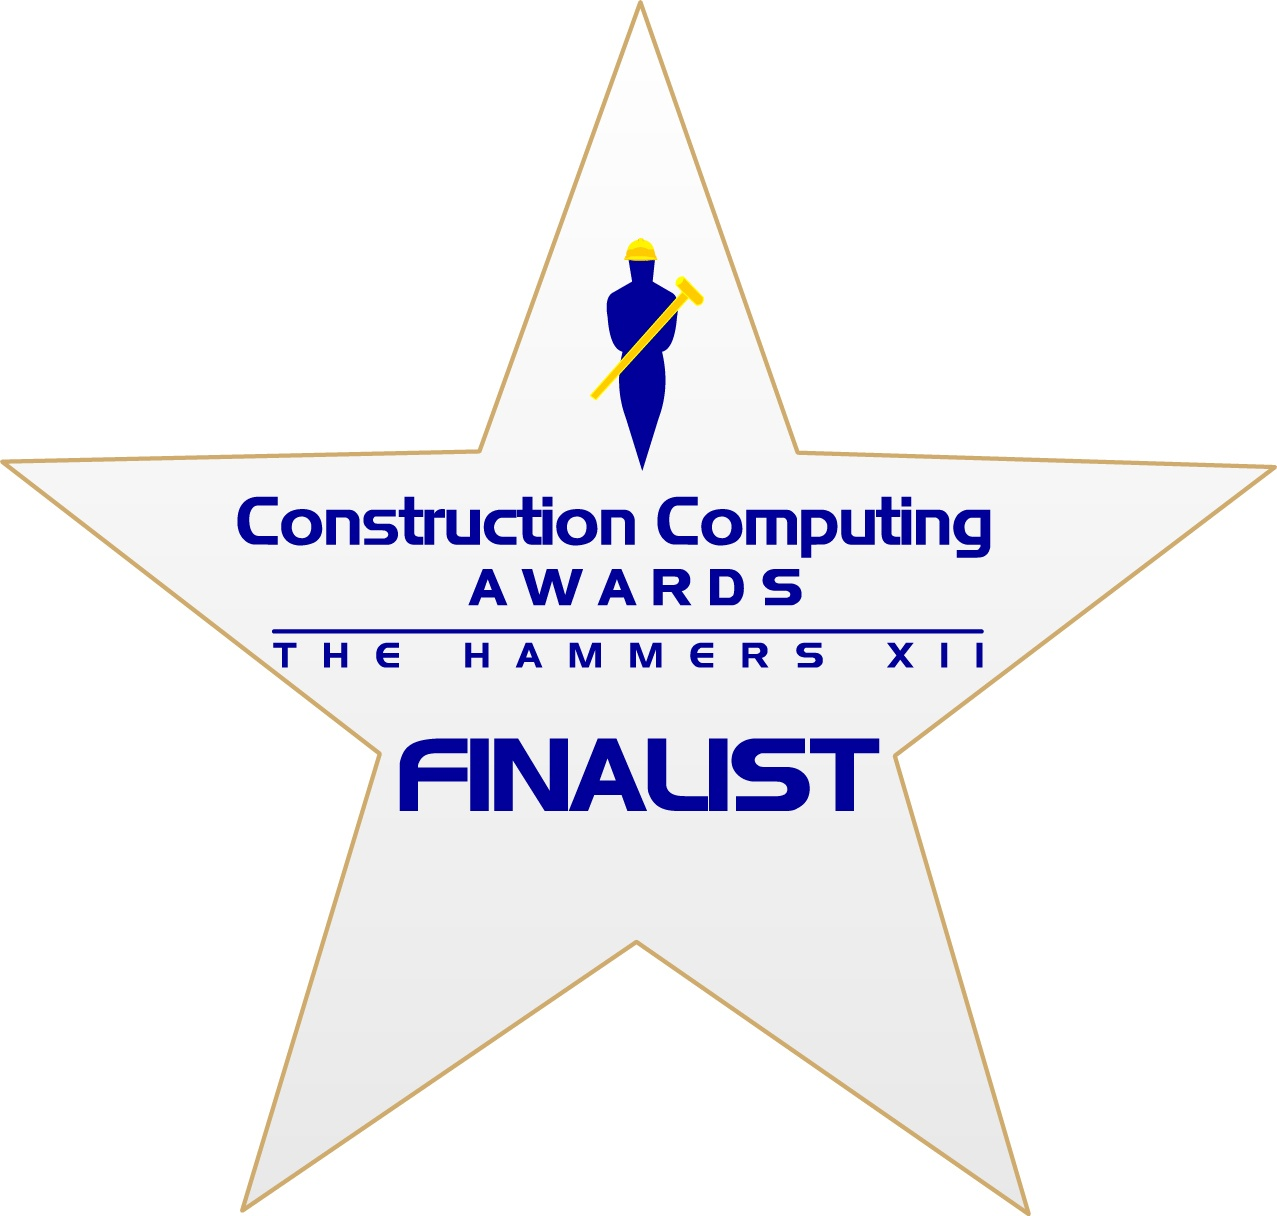 CC AWARD finalist.jpg